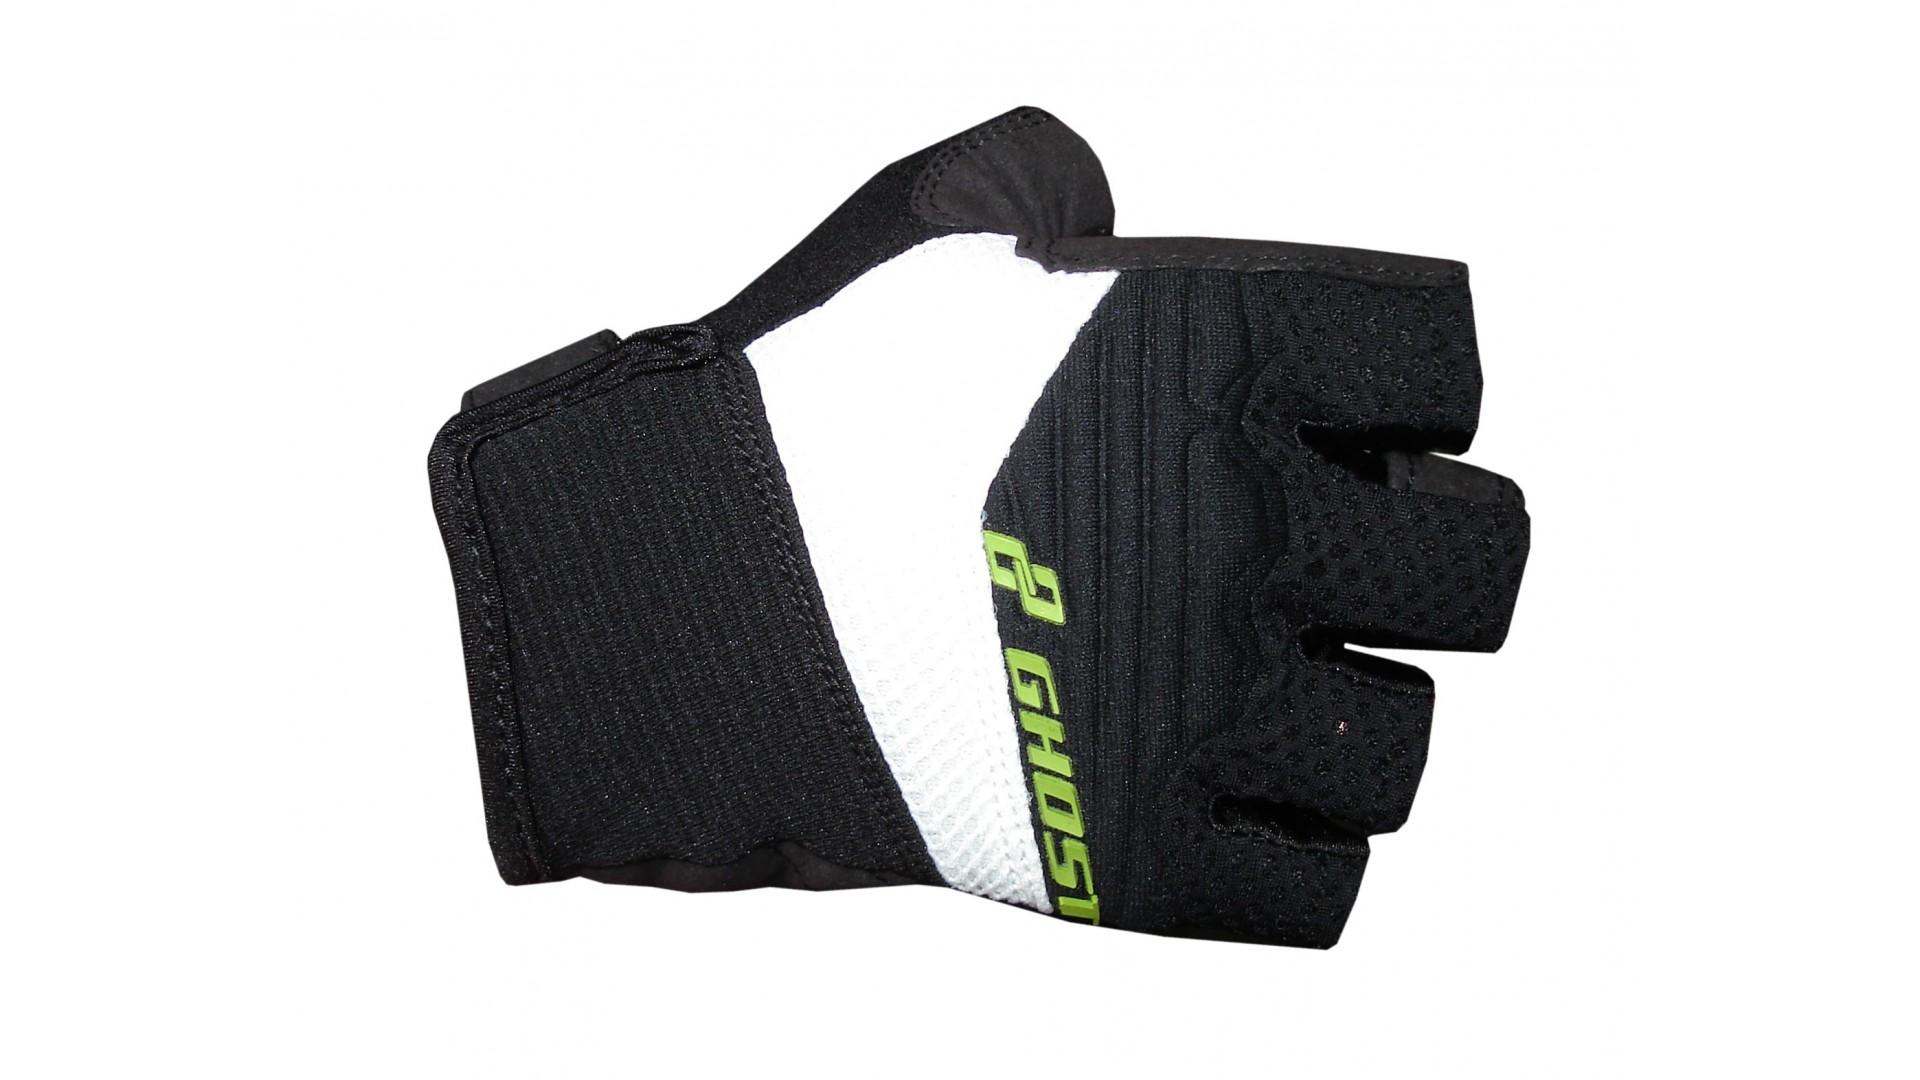 Велоперчатки Ghost летние короткие black/white/limegreen год 2015